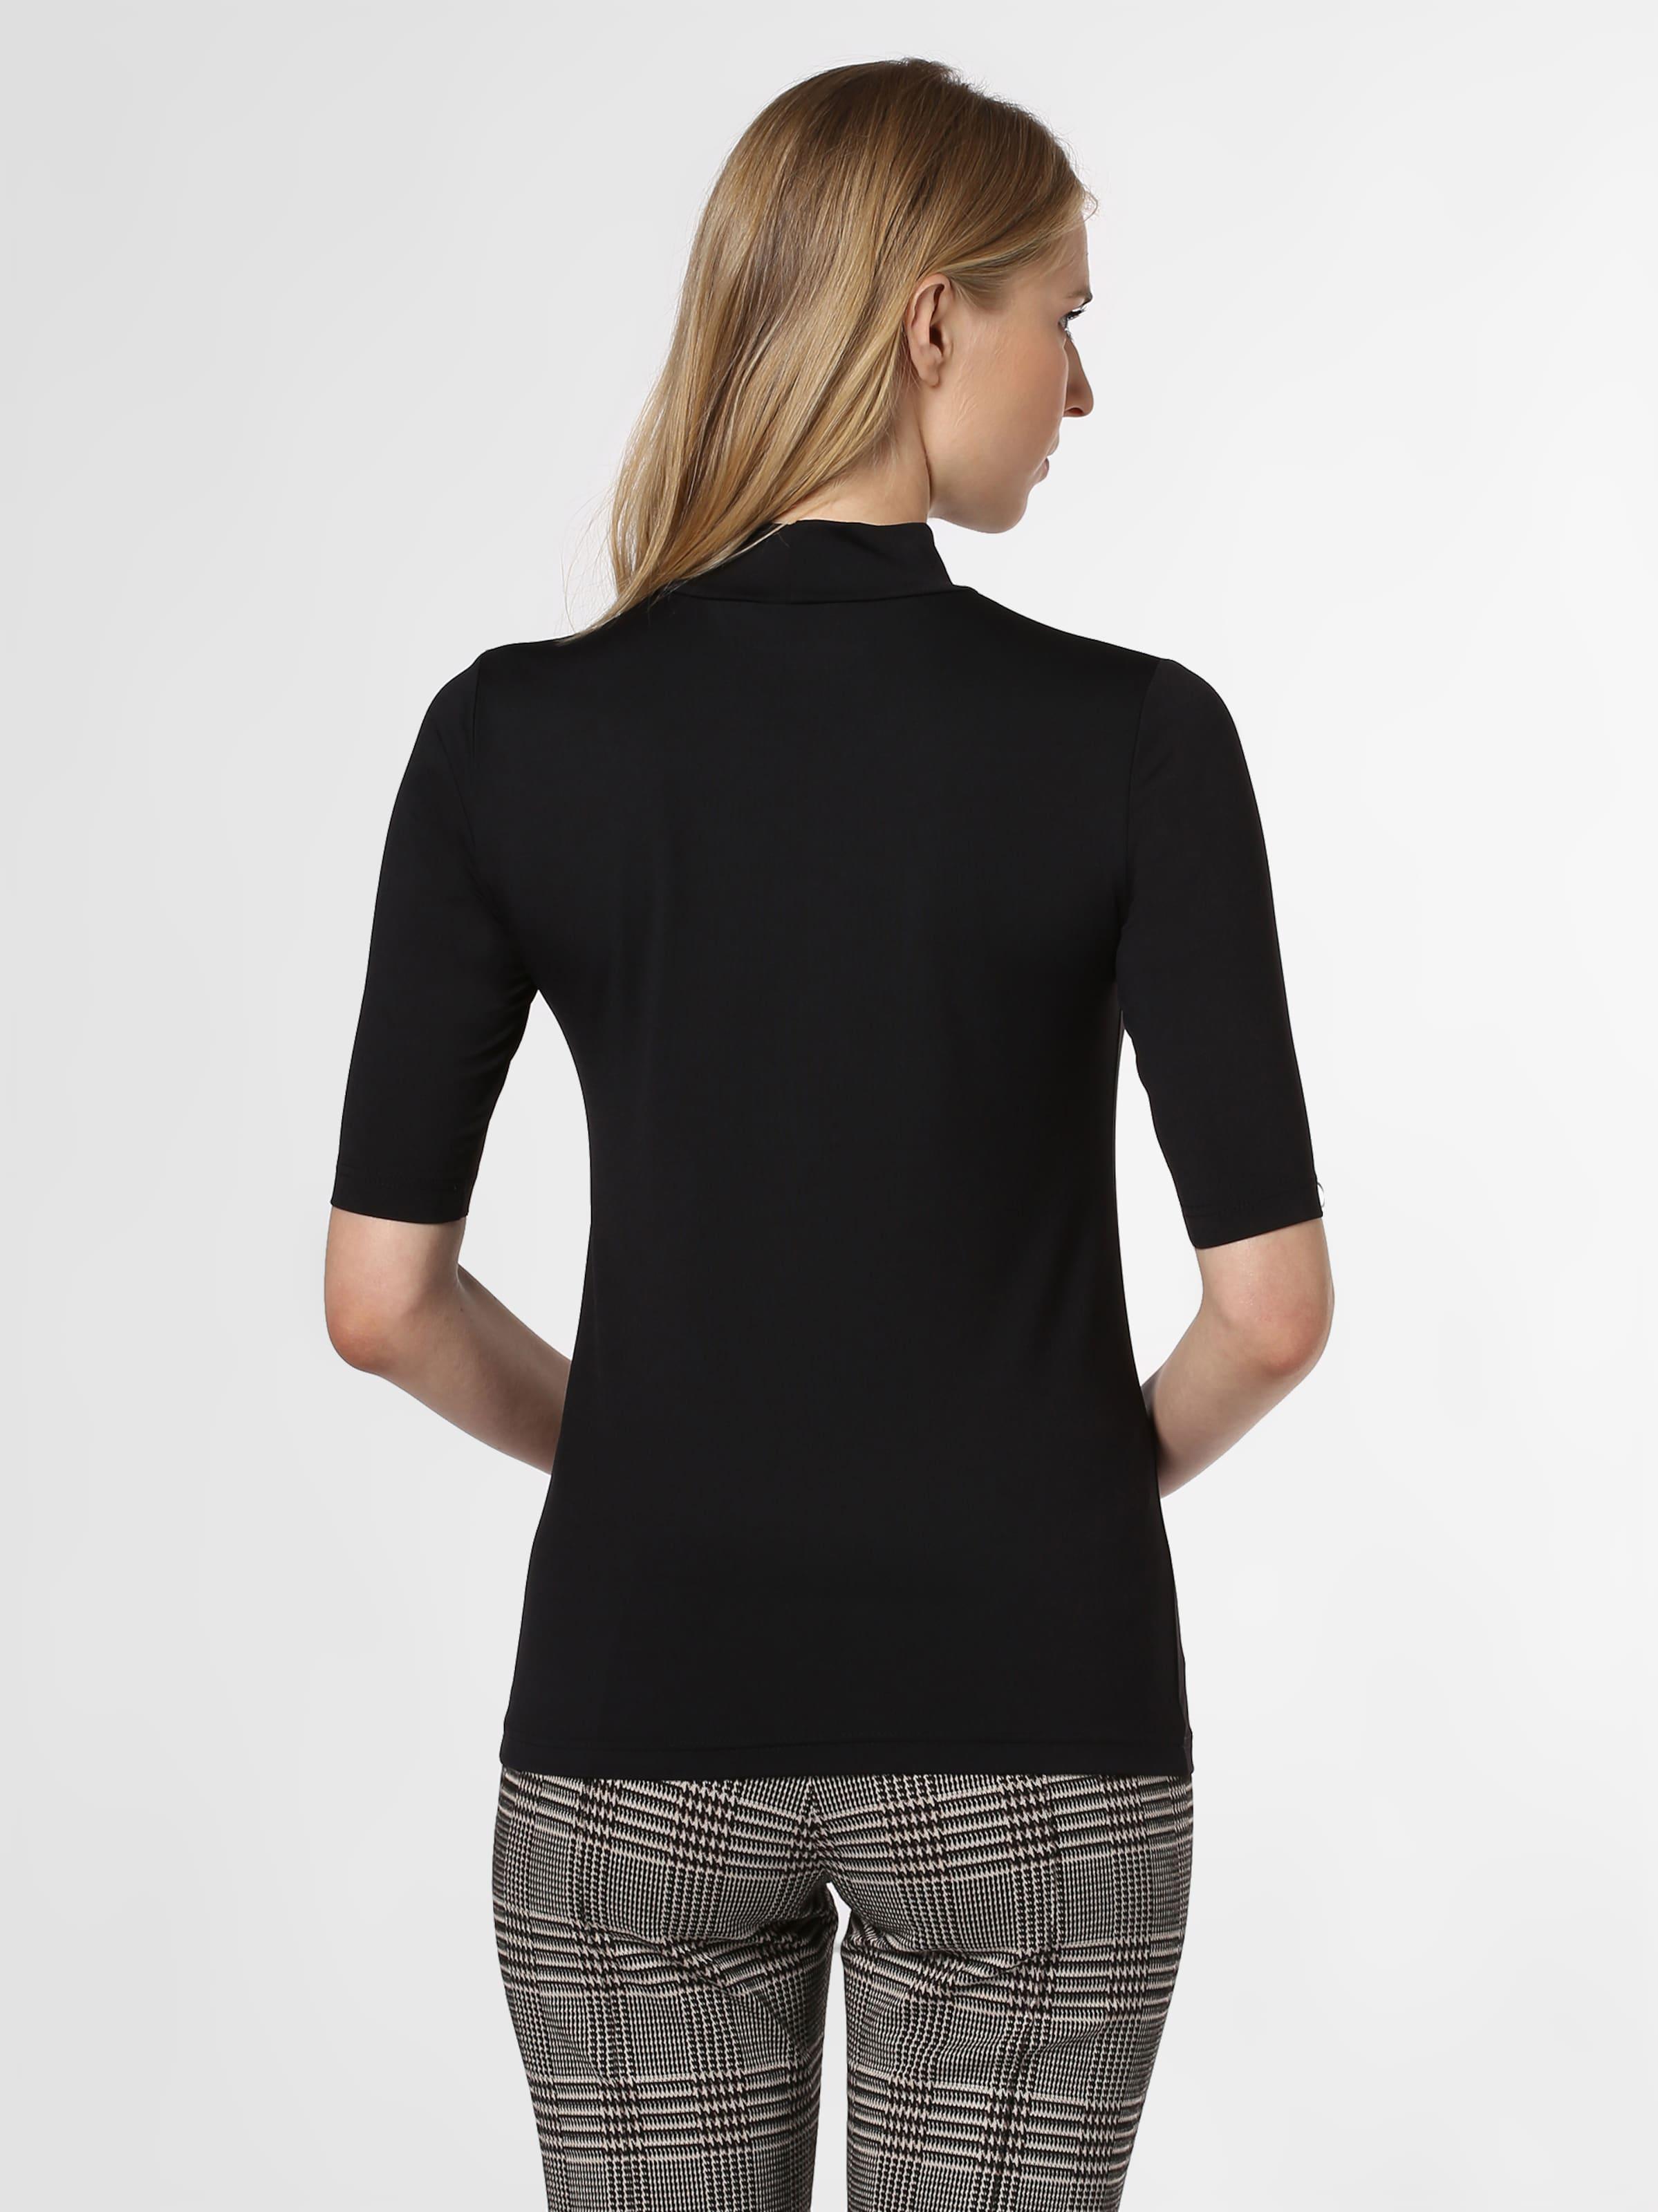 Shirt Shirt In Schwarz Apriori Apriori In rsQdth